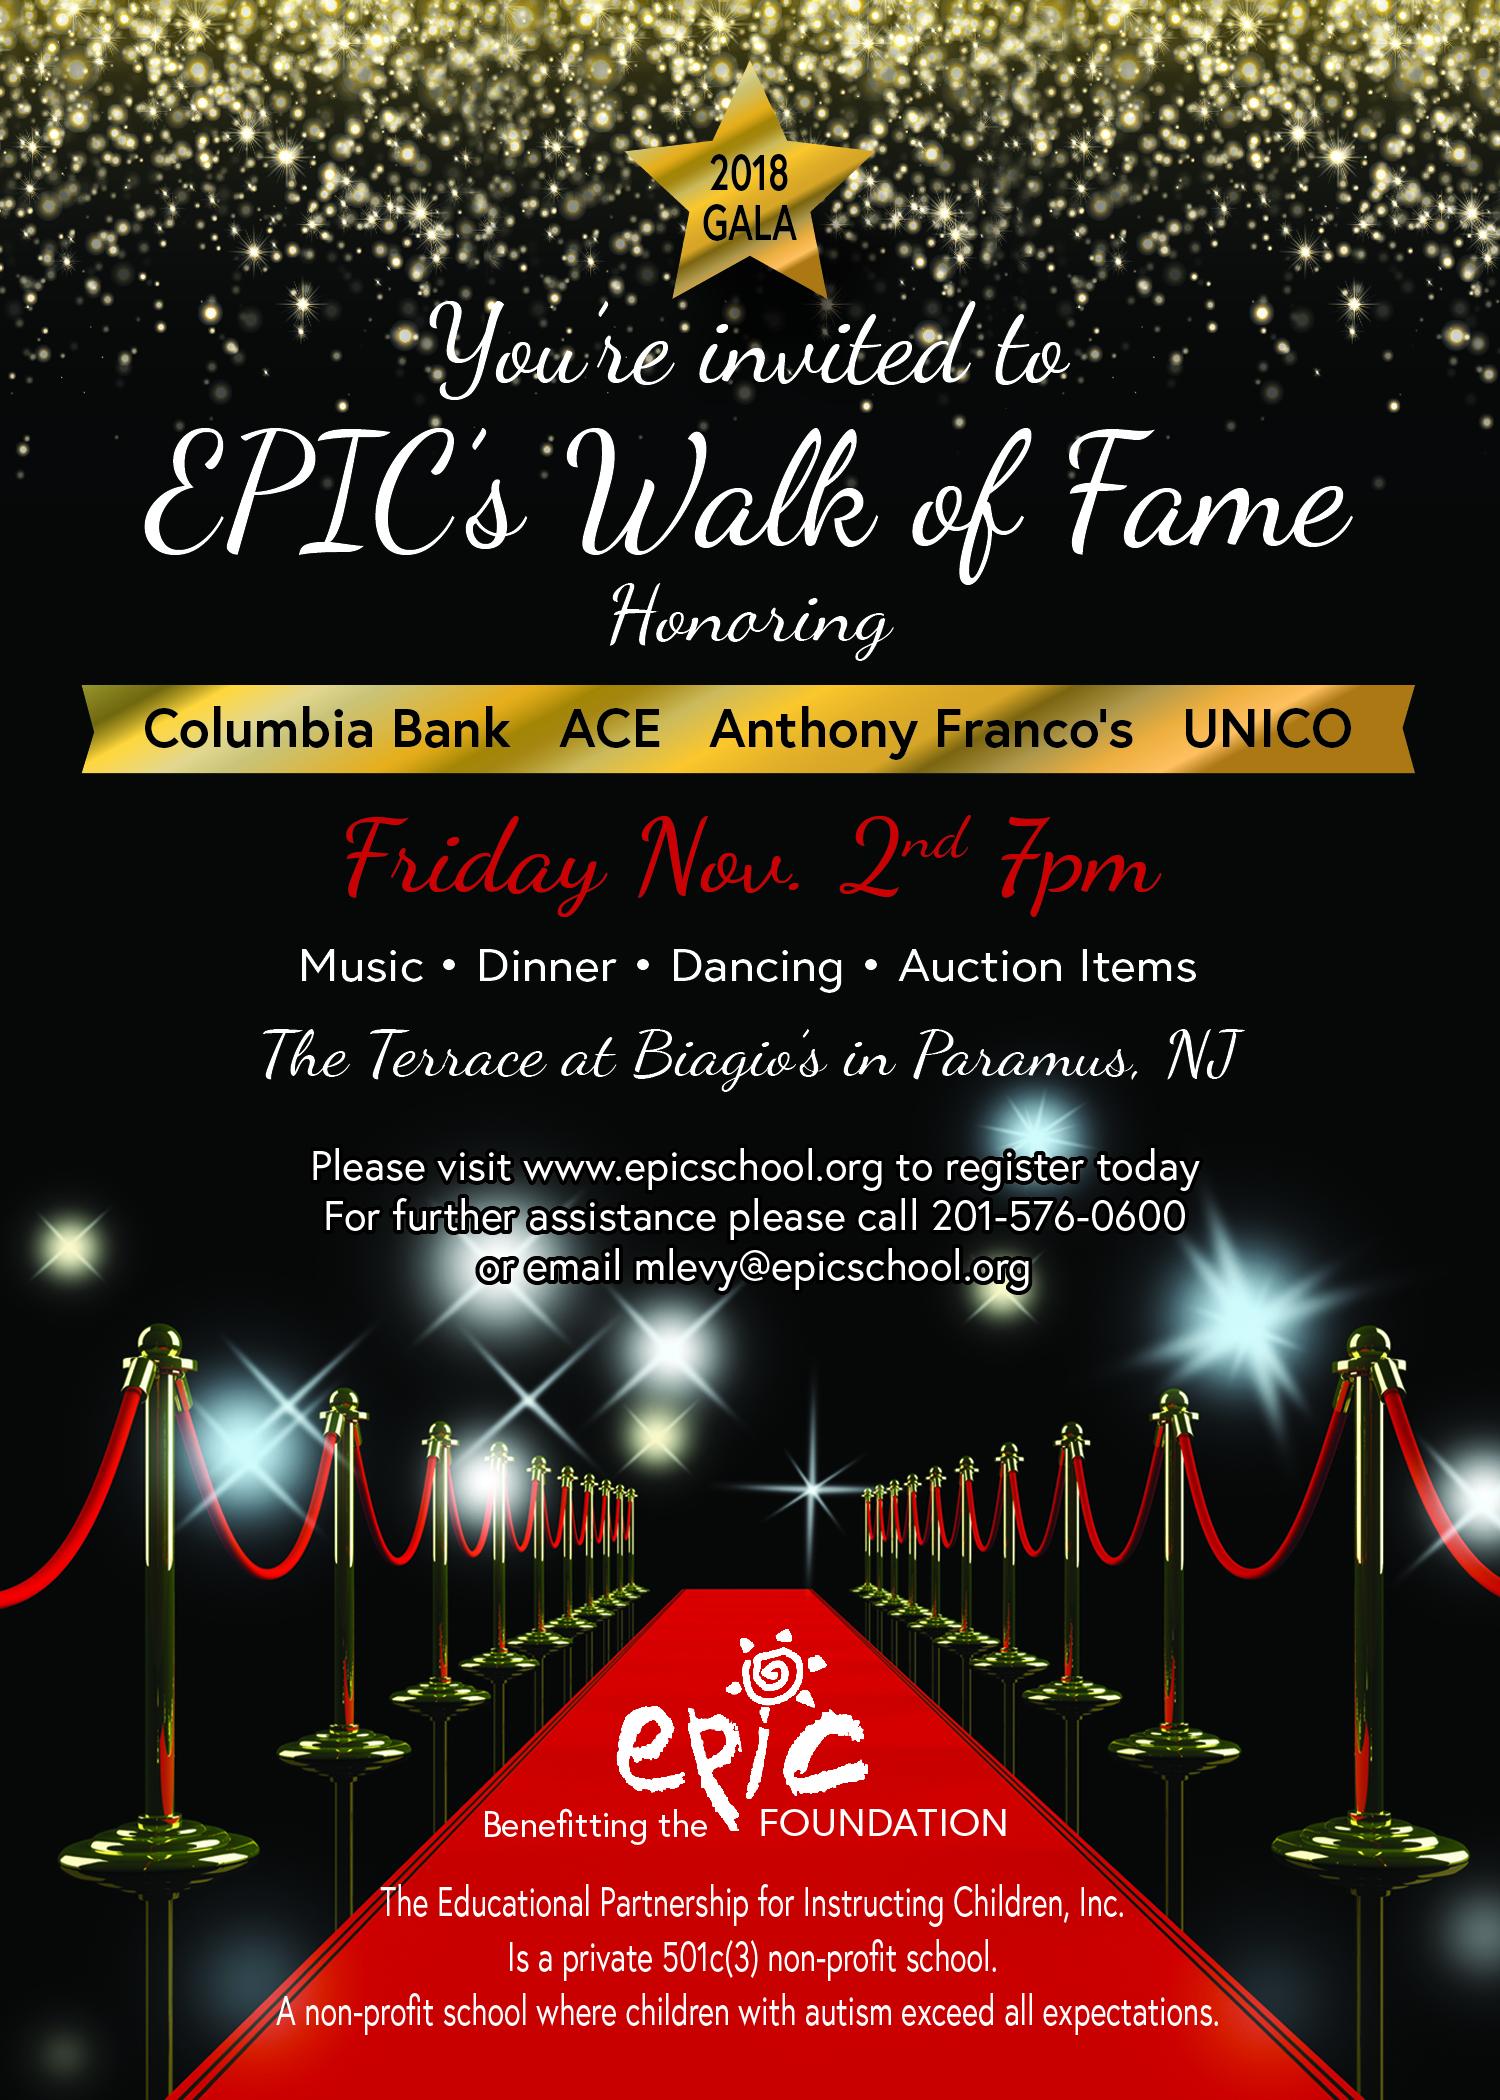 epic school invite-01.jpg